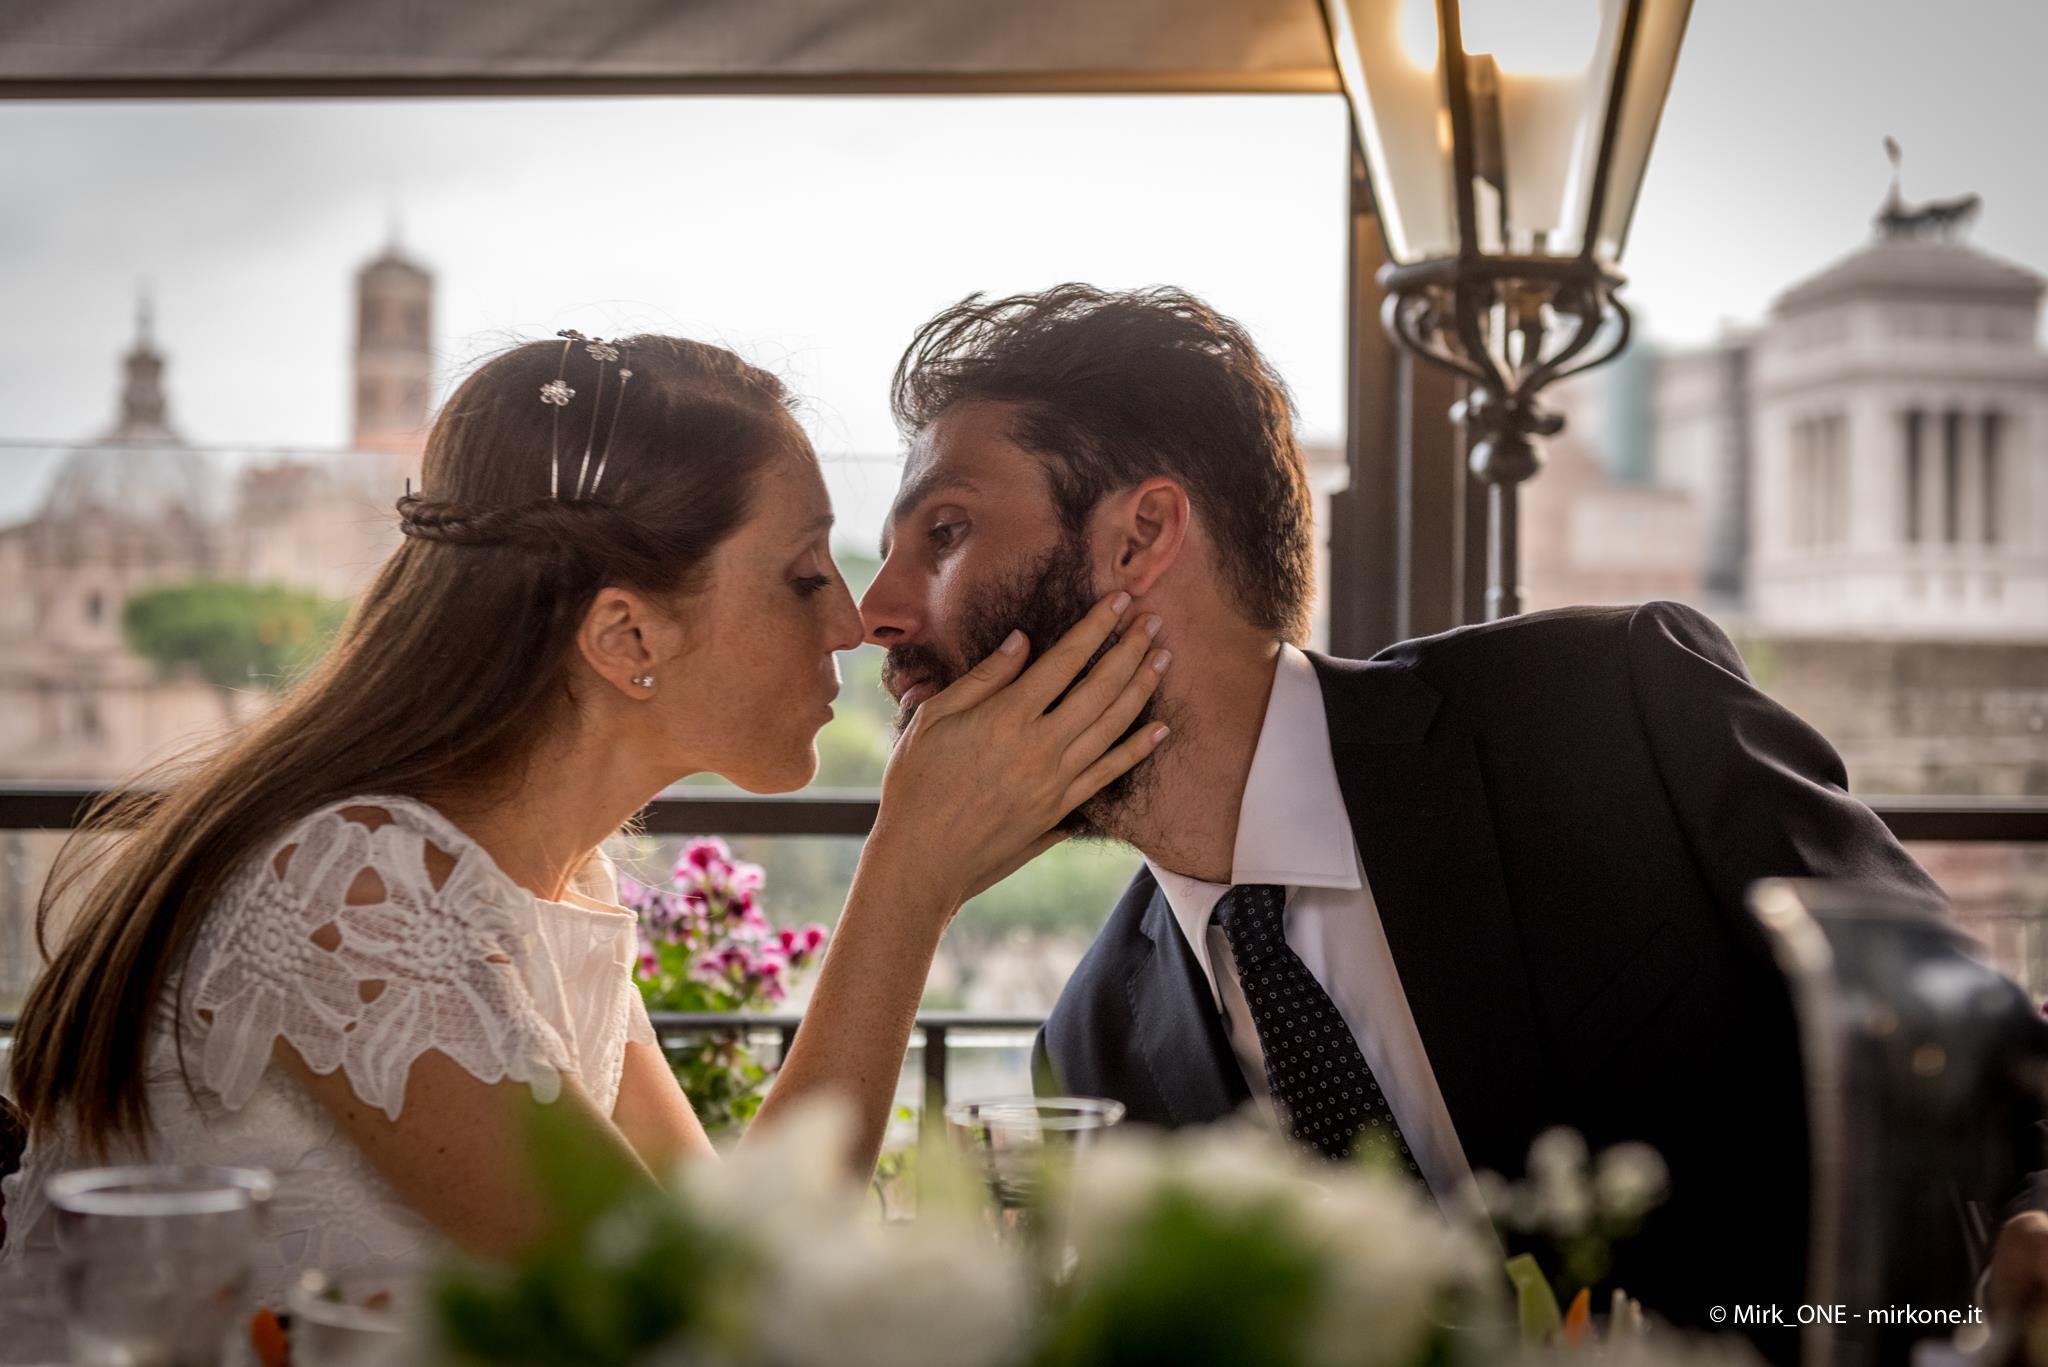 https://lnx.mirkone.it/wp-content/uploads/2015/07/mirk_ONE-fotografo-matrimonio-00807.jpg